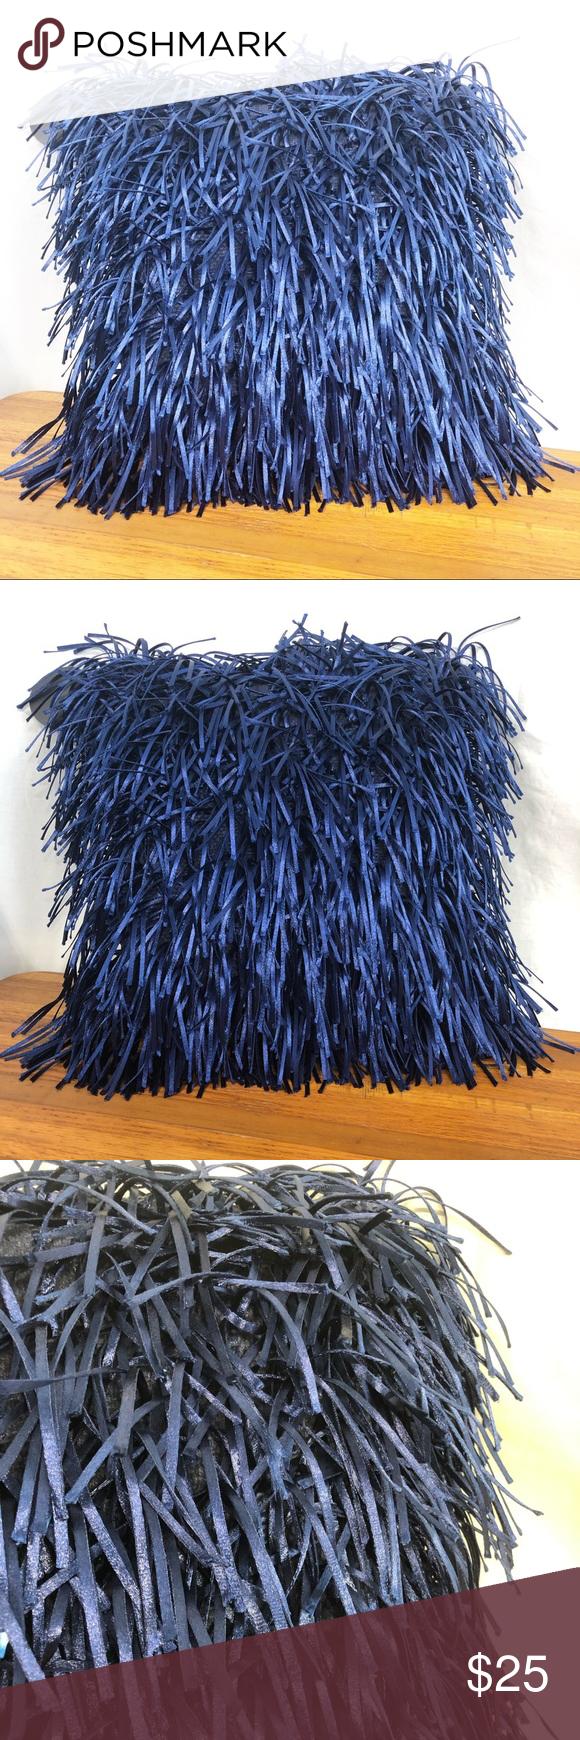 Cynthia Rowley Blue Fringe Decorative Pillow Cynthia Rowley metallic blue fringe Cynthia Rowley Blue